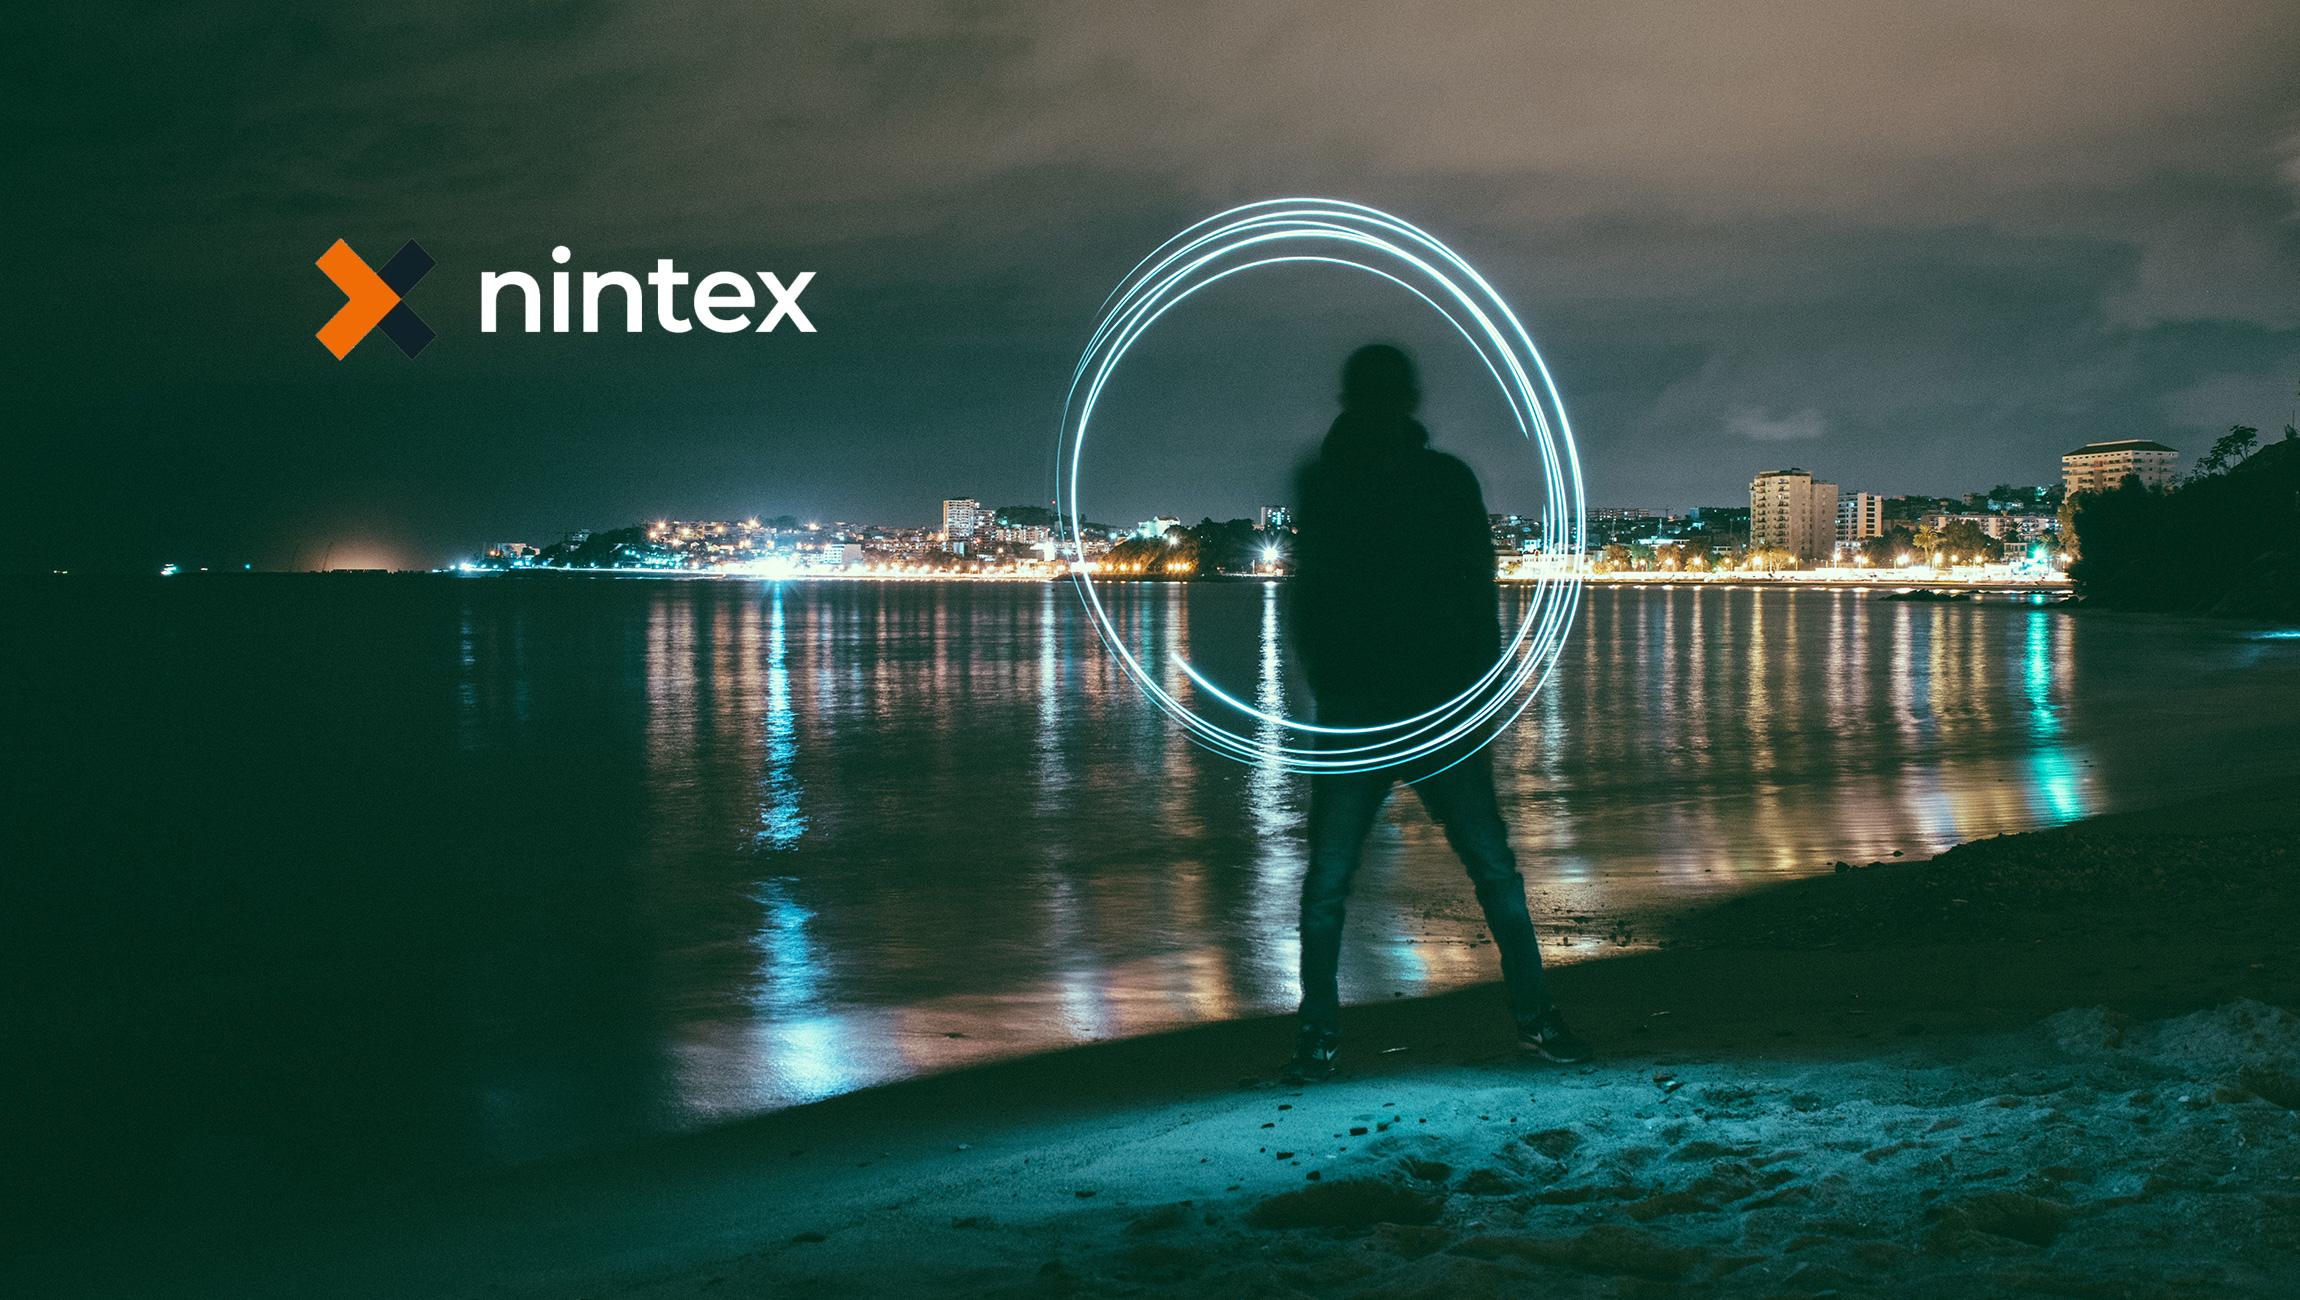 Nintex Drawloop DocGen and Adobe Sign Power Digital Document Workflows